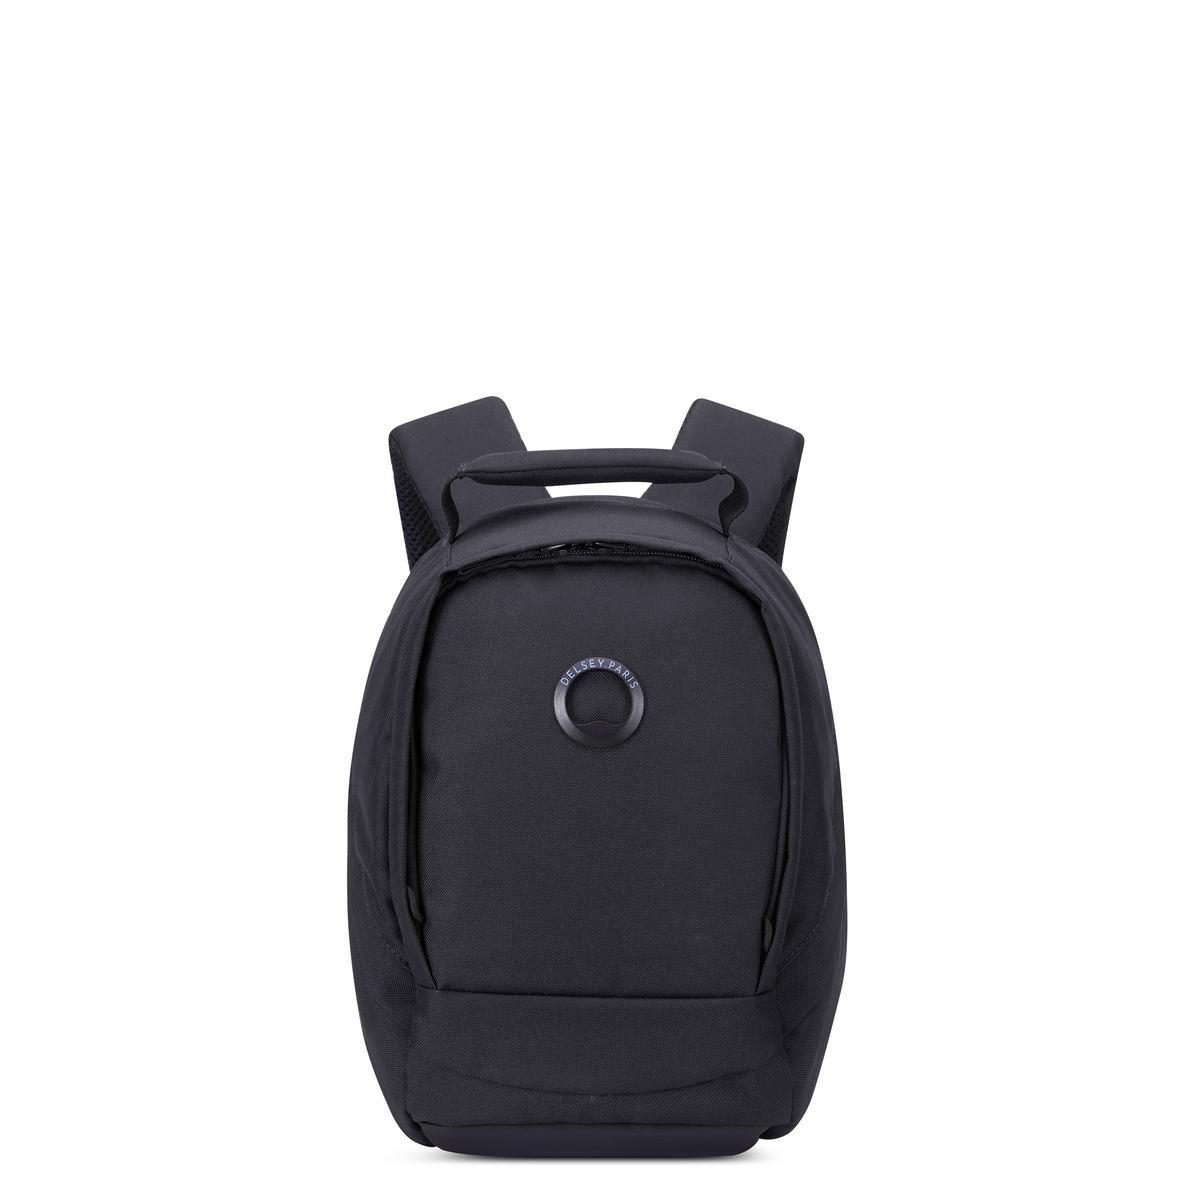 Delsey σακίδιο πλάτης 30.5x21.5x14.5cm Securban Micro Black